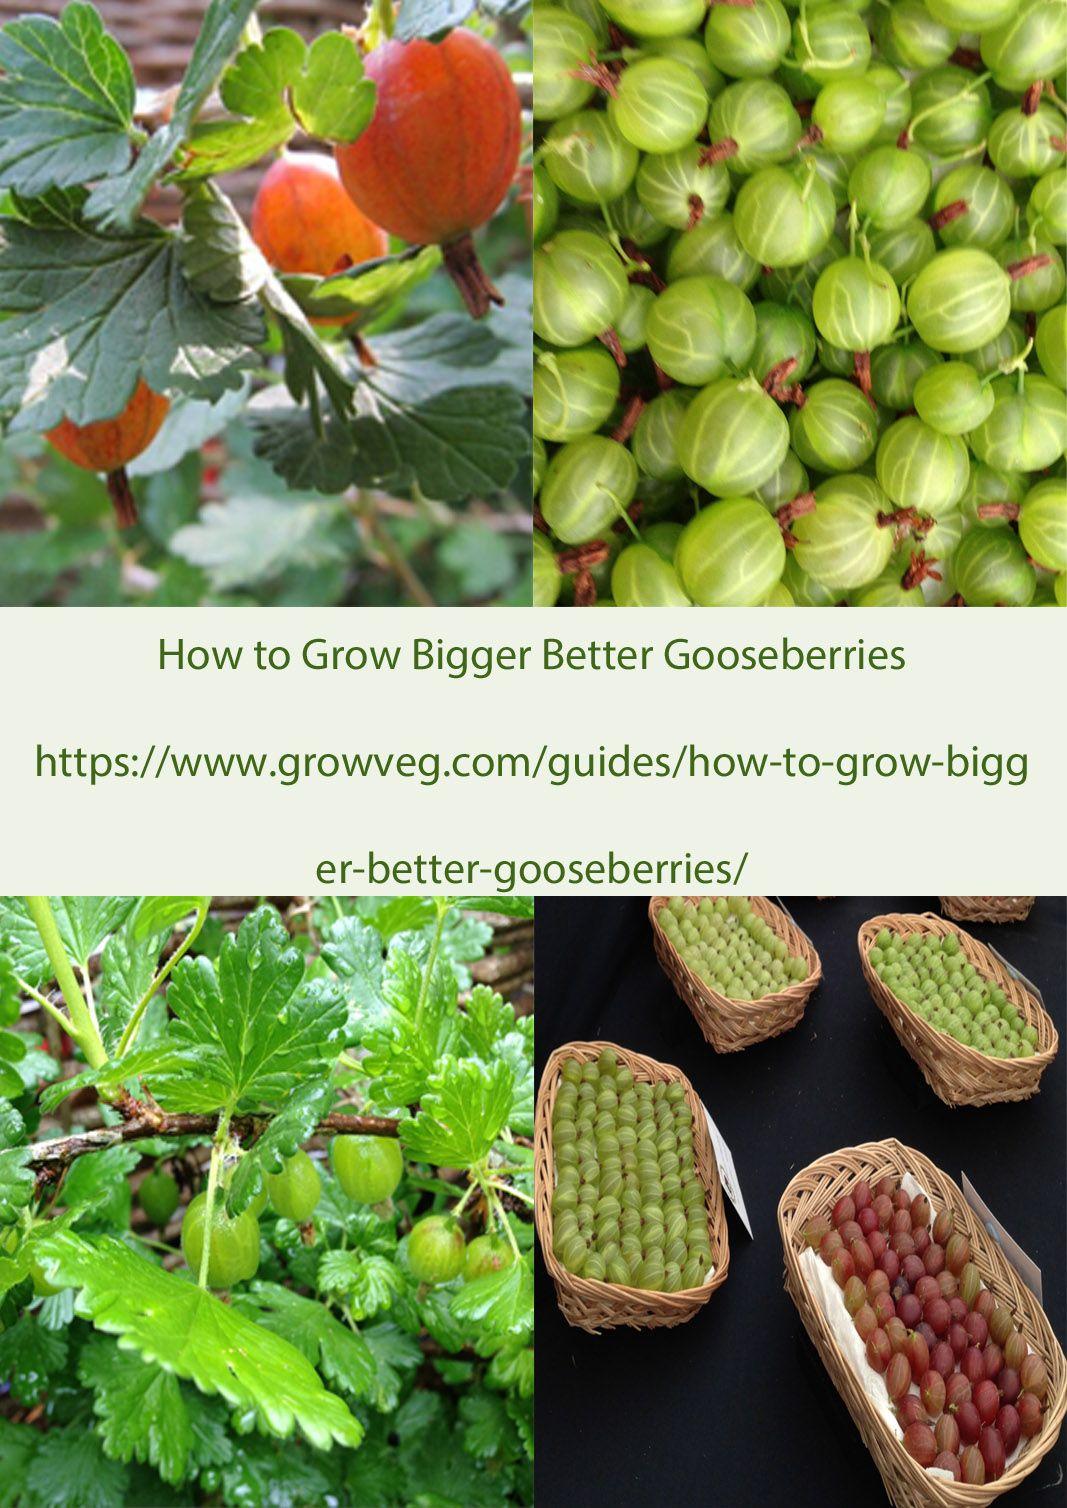 How To Grow Gooseberries of distinction! How to grow bigger, better fruit https://www.growveg.com/guides/how-to-grow-bigger-better-gooseberries/  How to prune gooseberries too https://www.growveg.com/guides/how-to-winter-prune-gooseberries-and-currant-bushes/